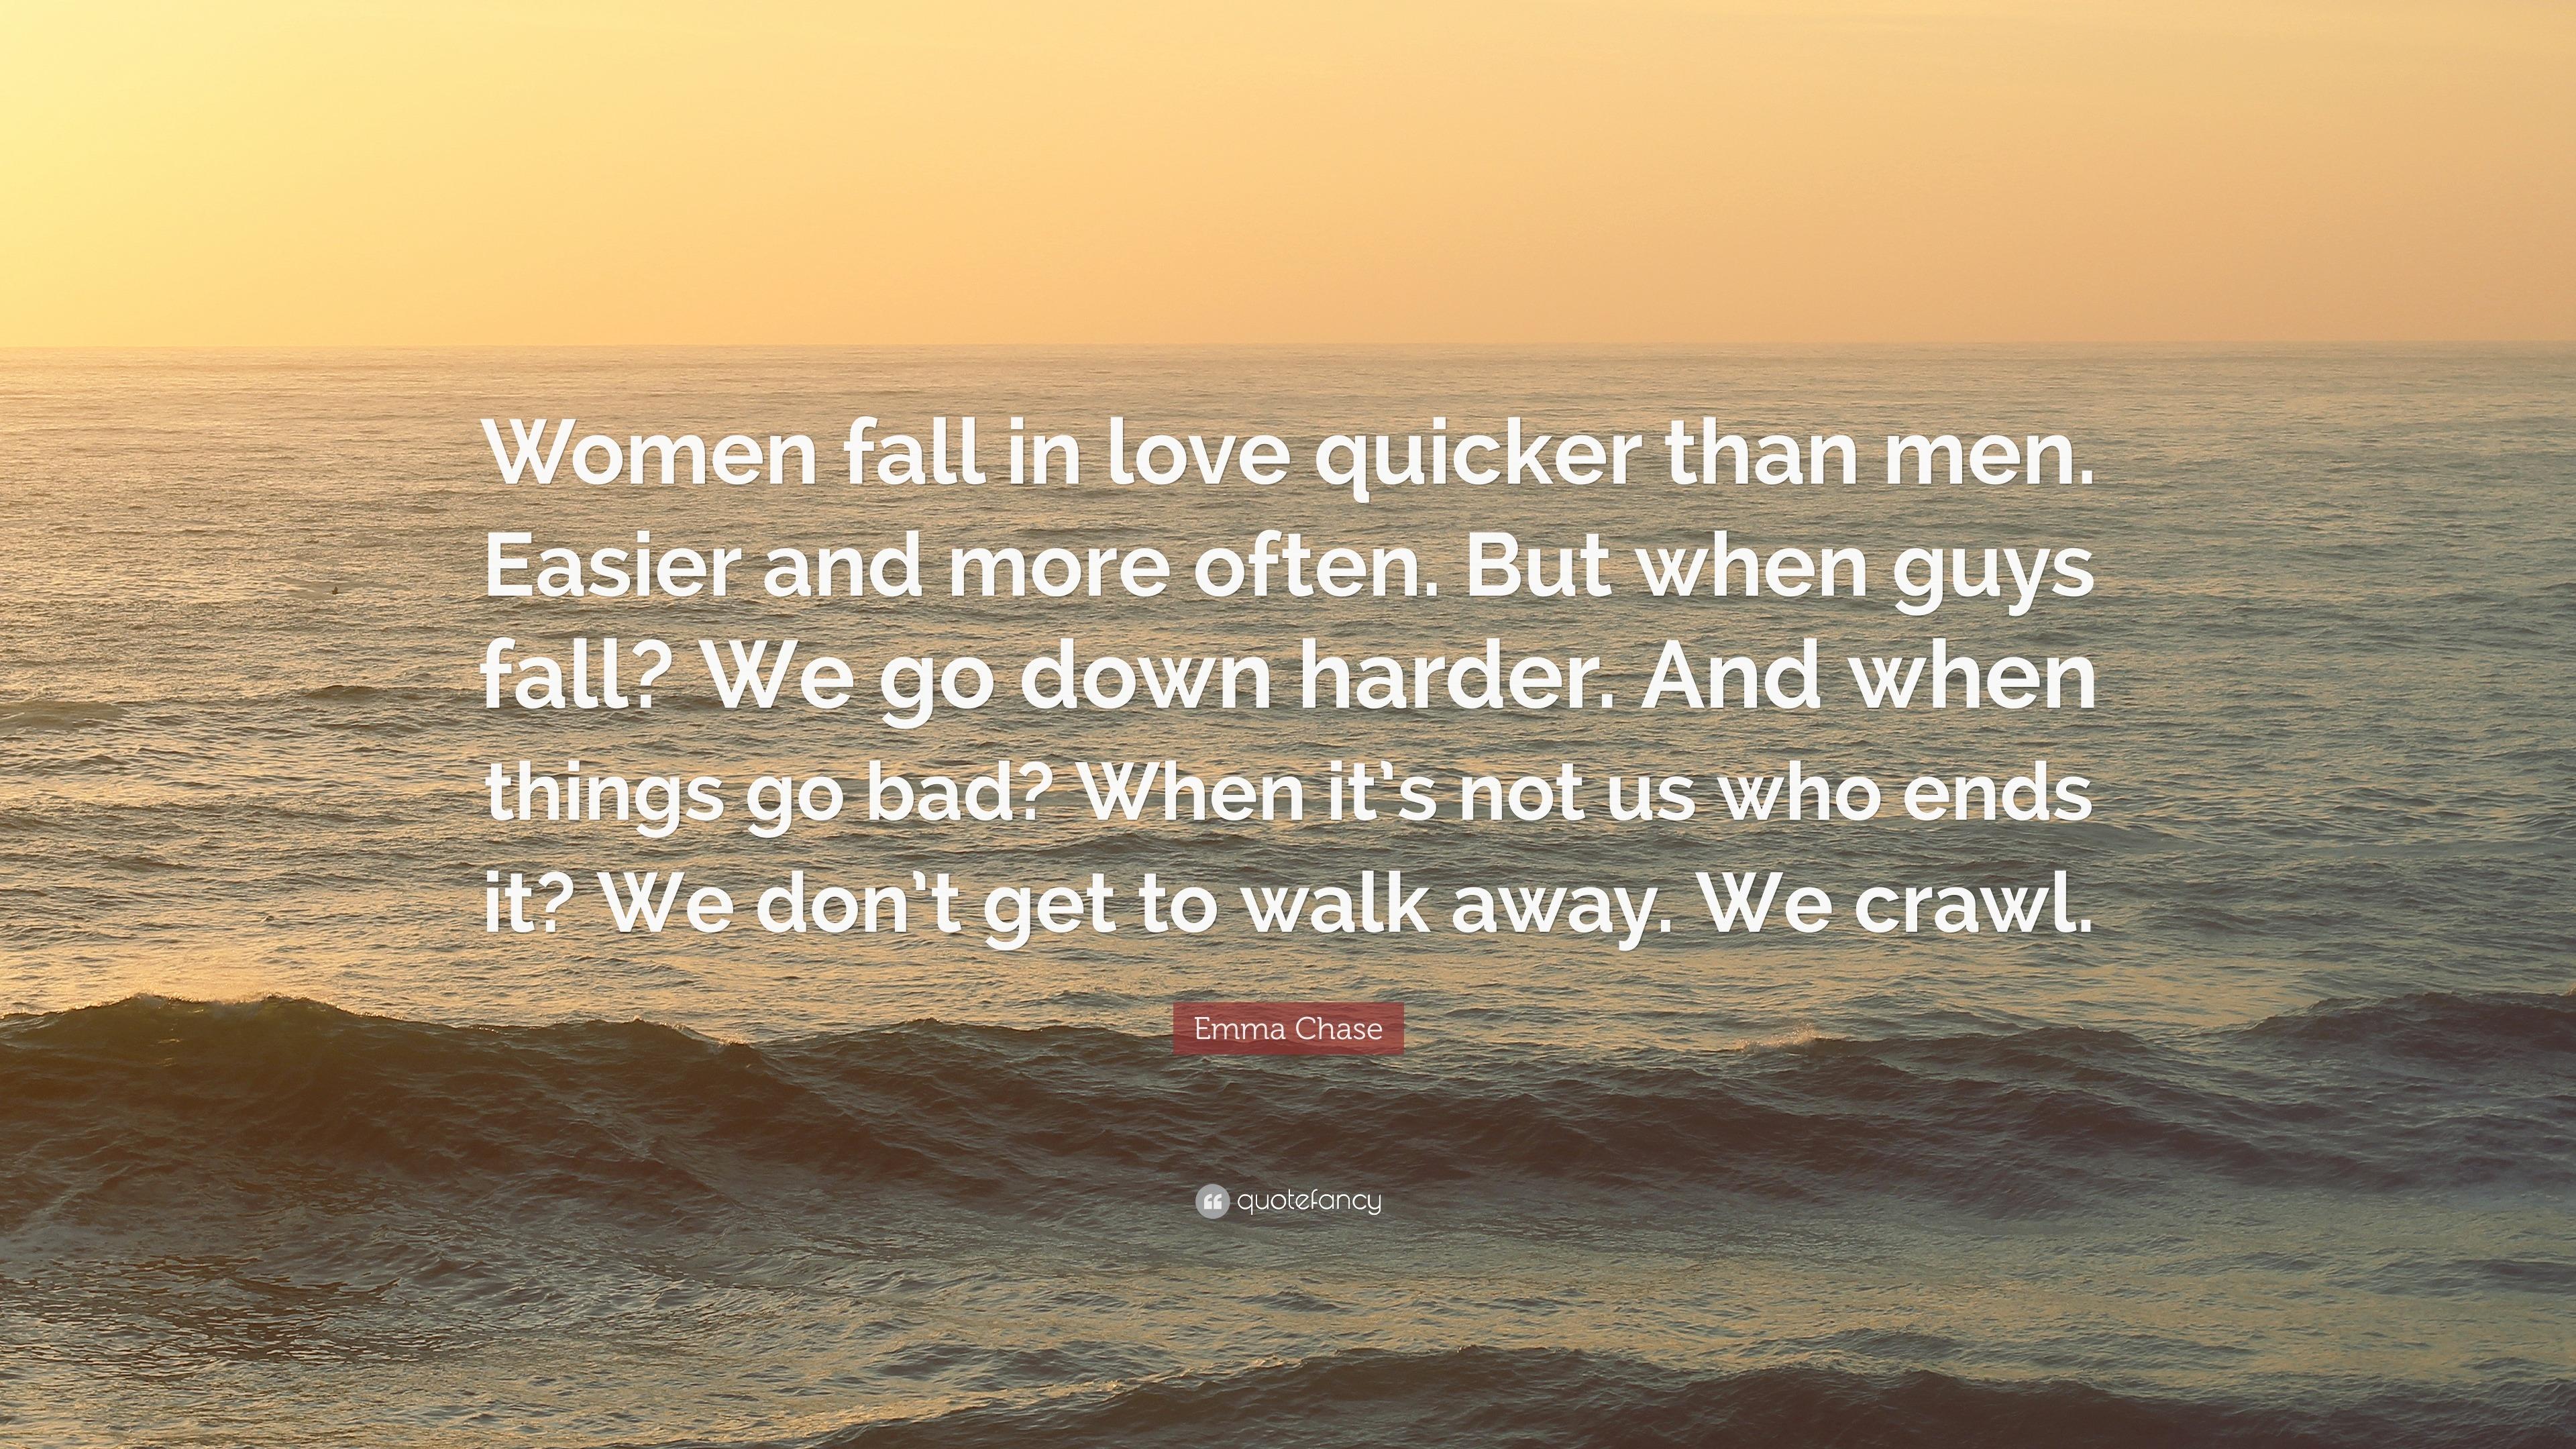 Do women fall in love faster than men